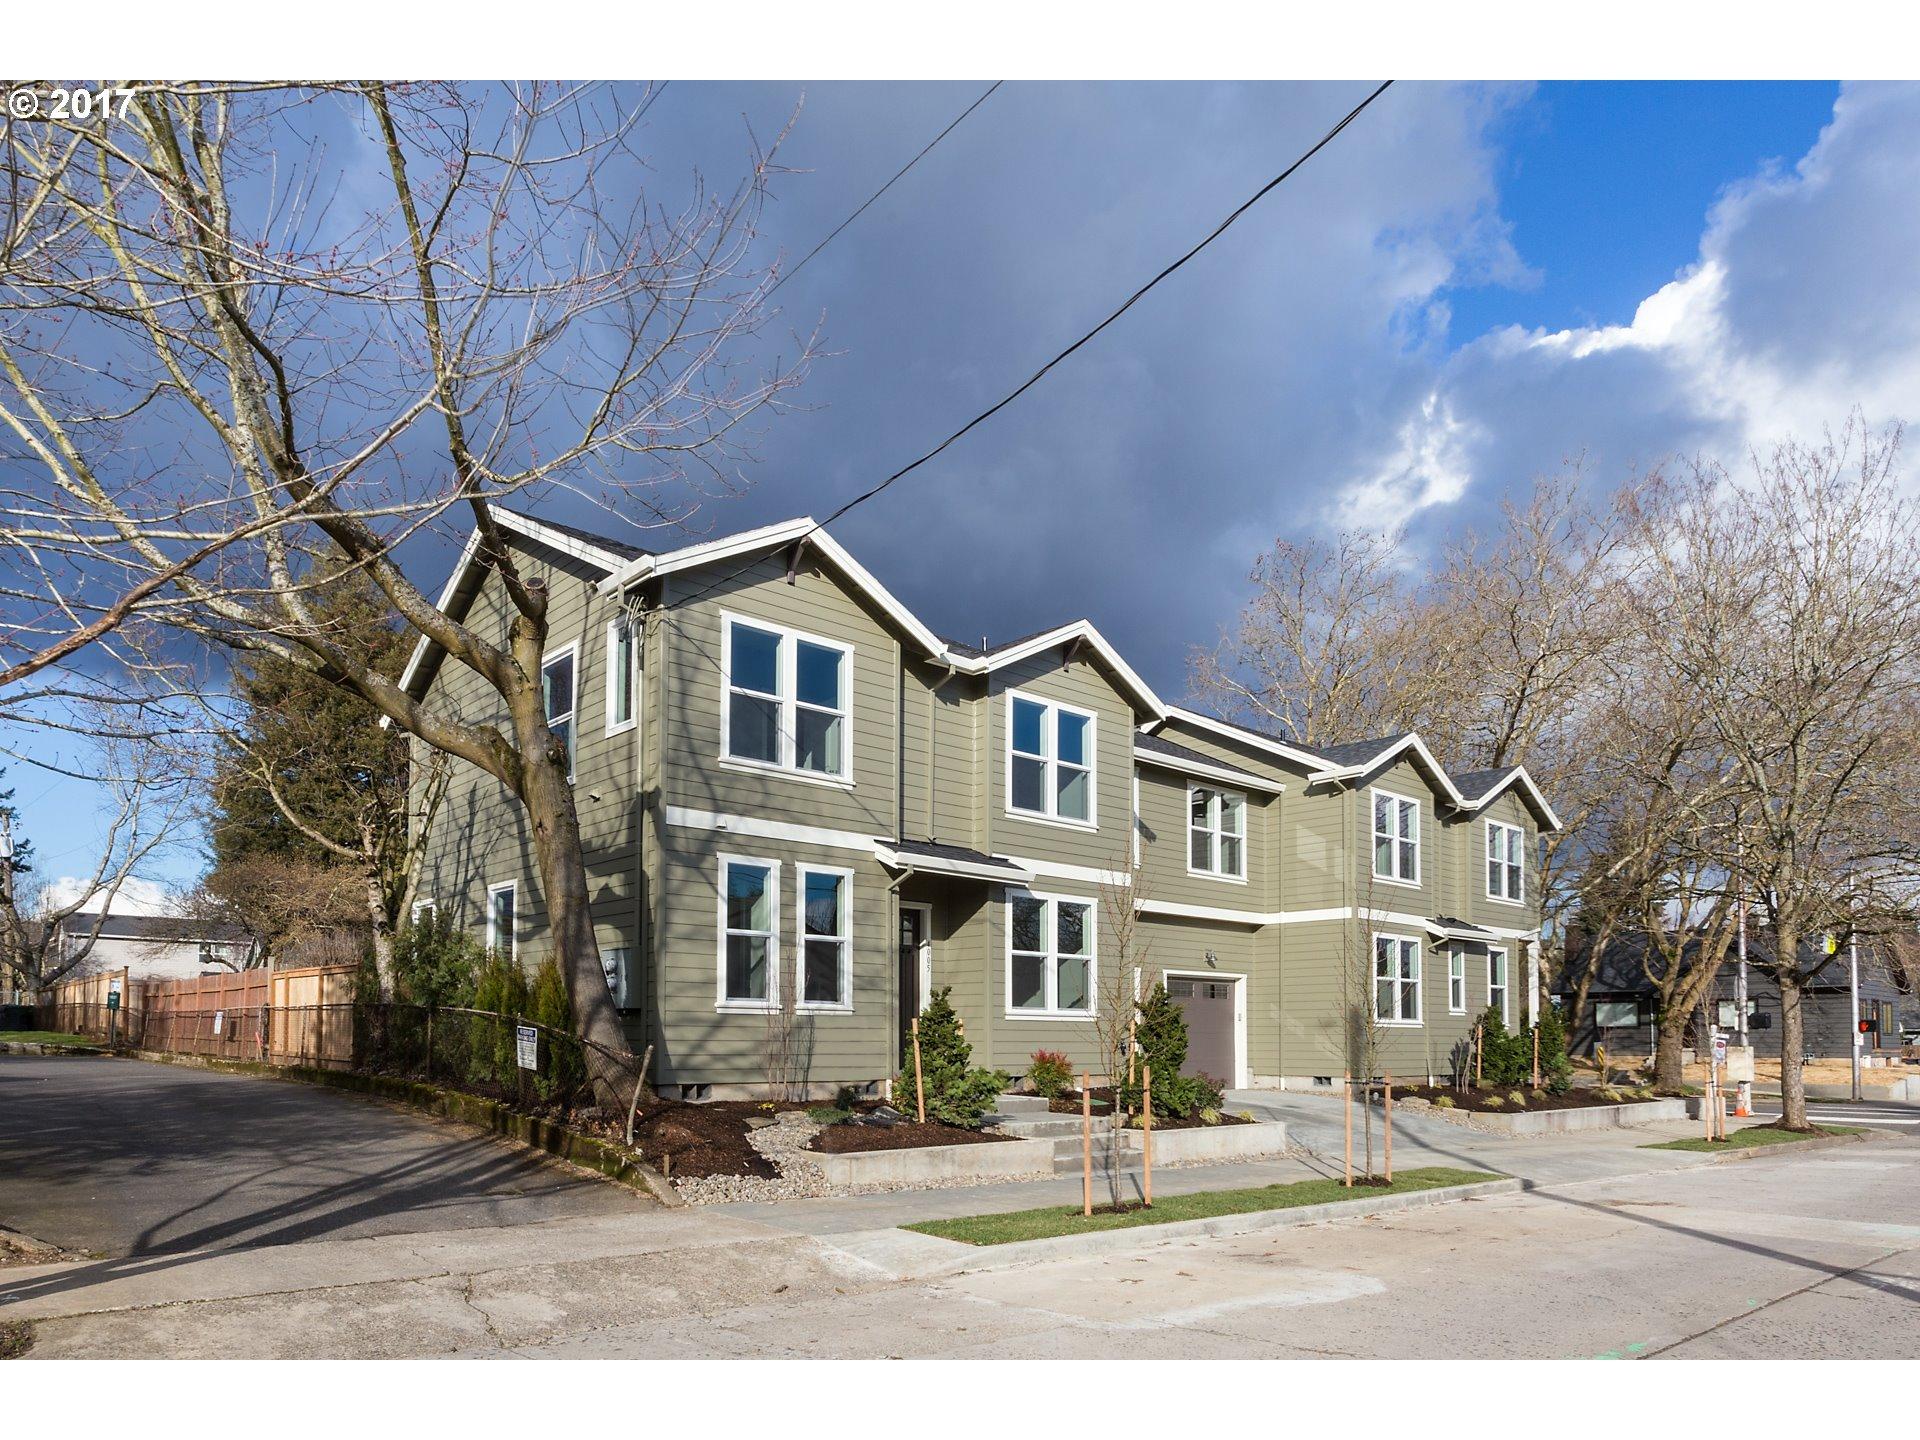 1455 NE Shaver ST, Portland, OR 97212